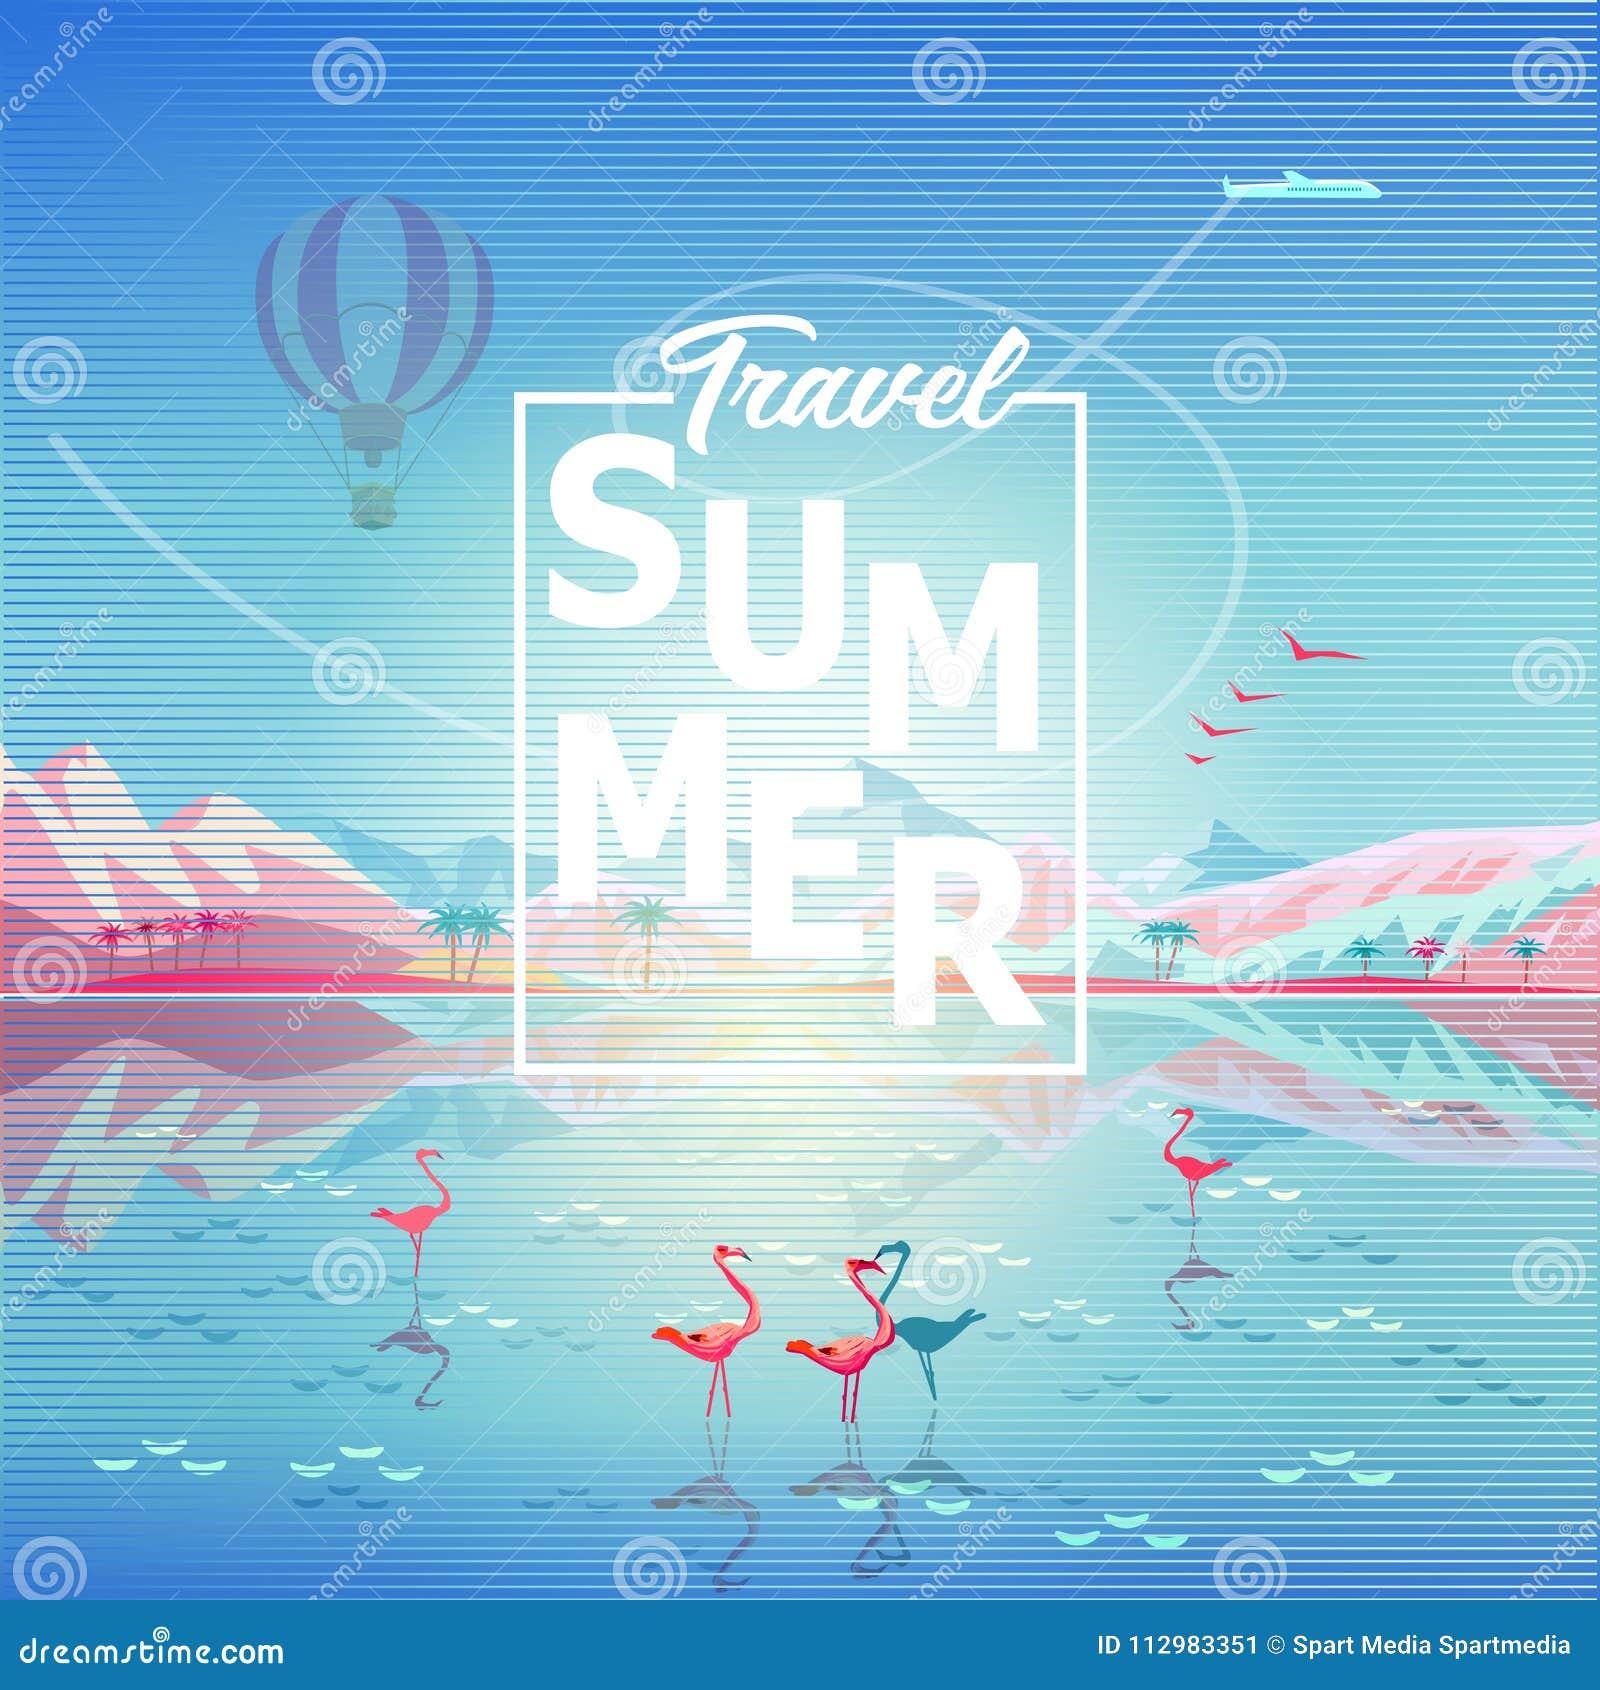 Summer Travel adventure rocky mountains reflection tropical sea beach flamingo